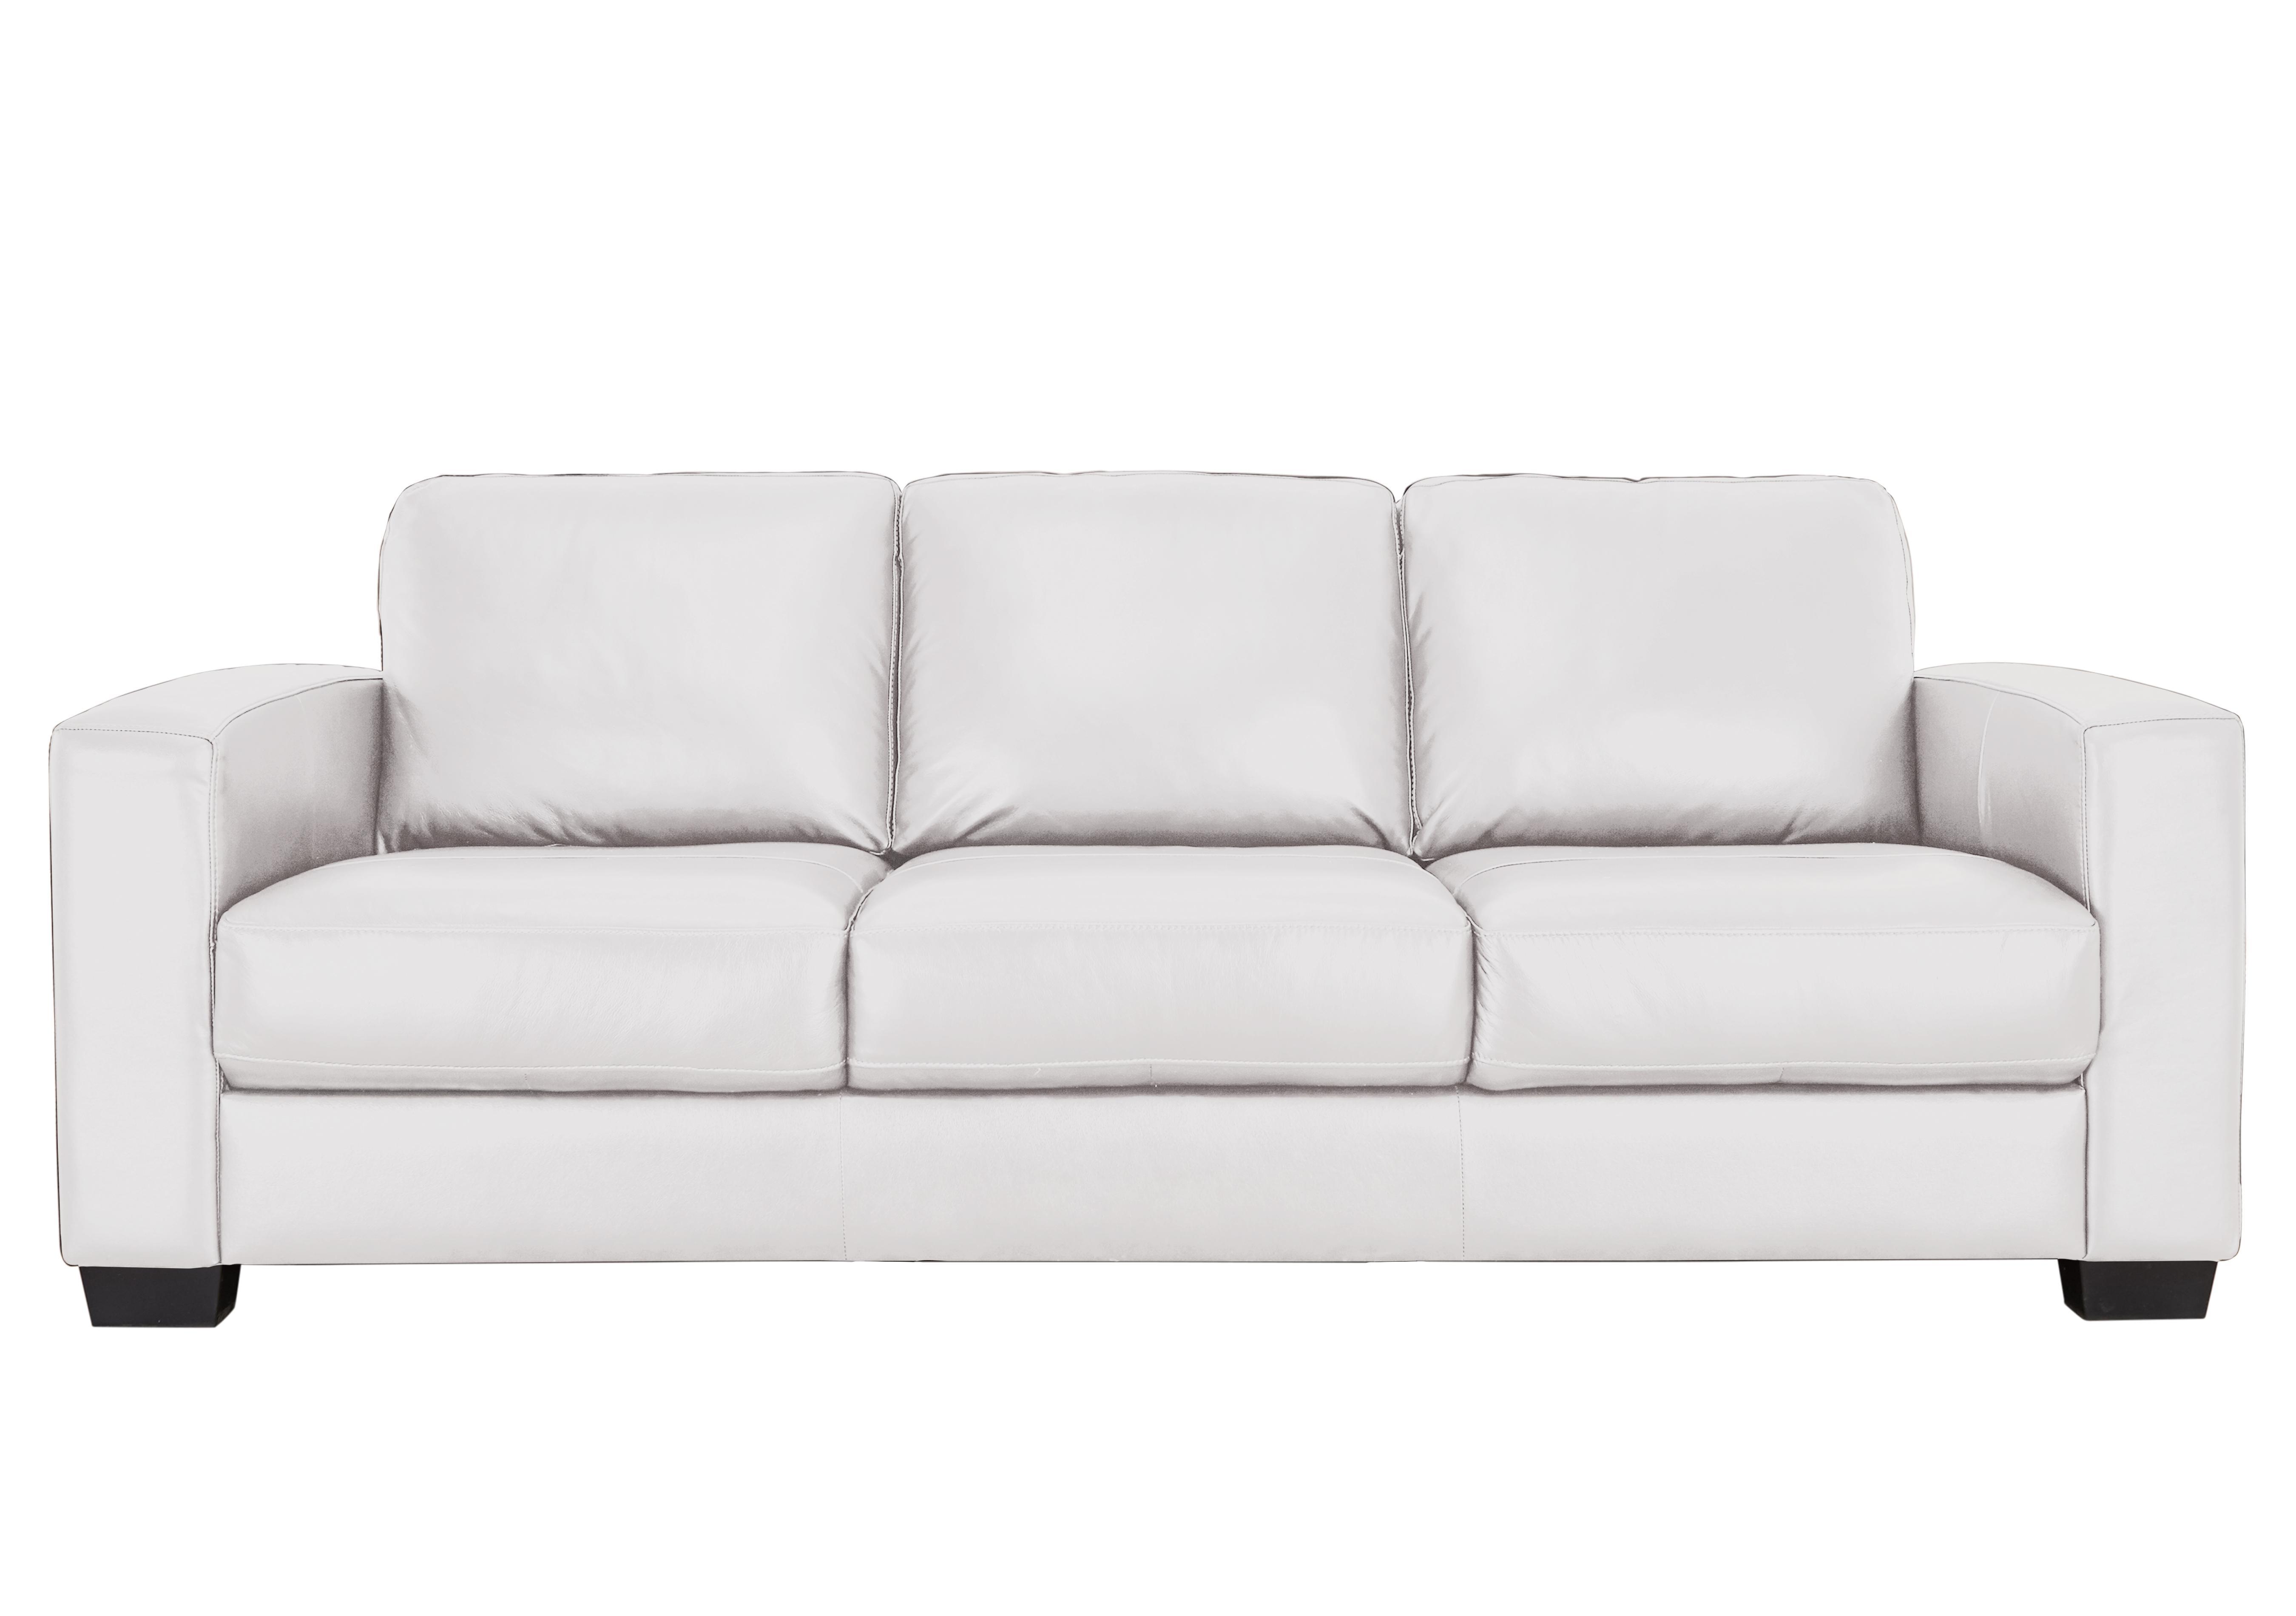 Save £100. Dante 3 Seater Leather Sofa